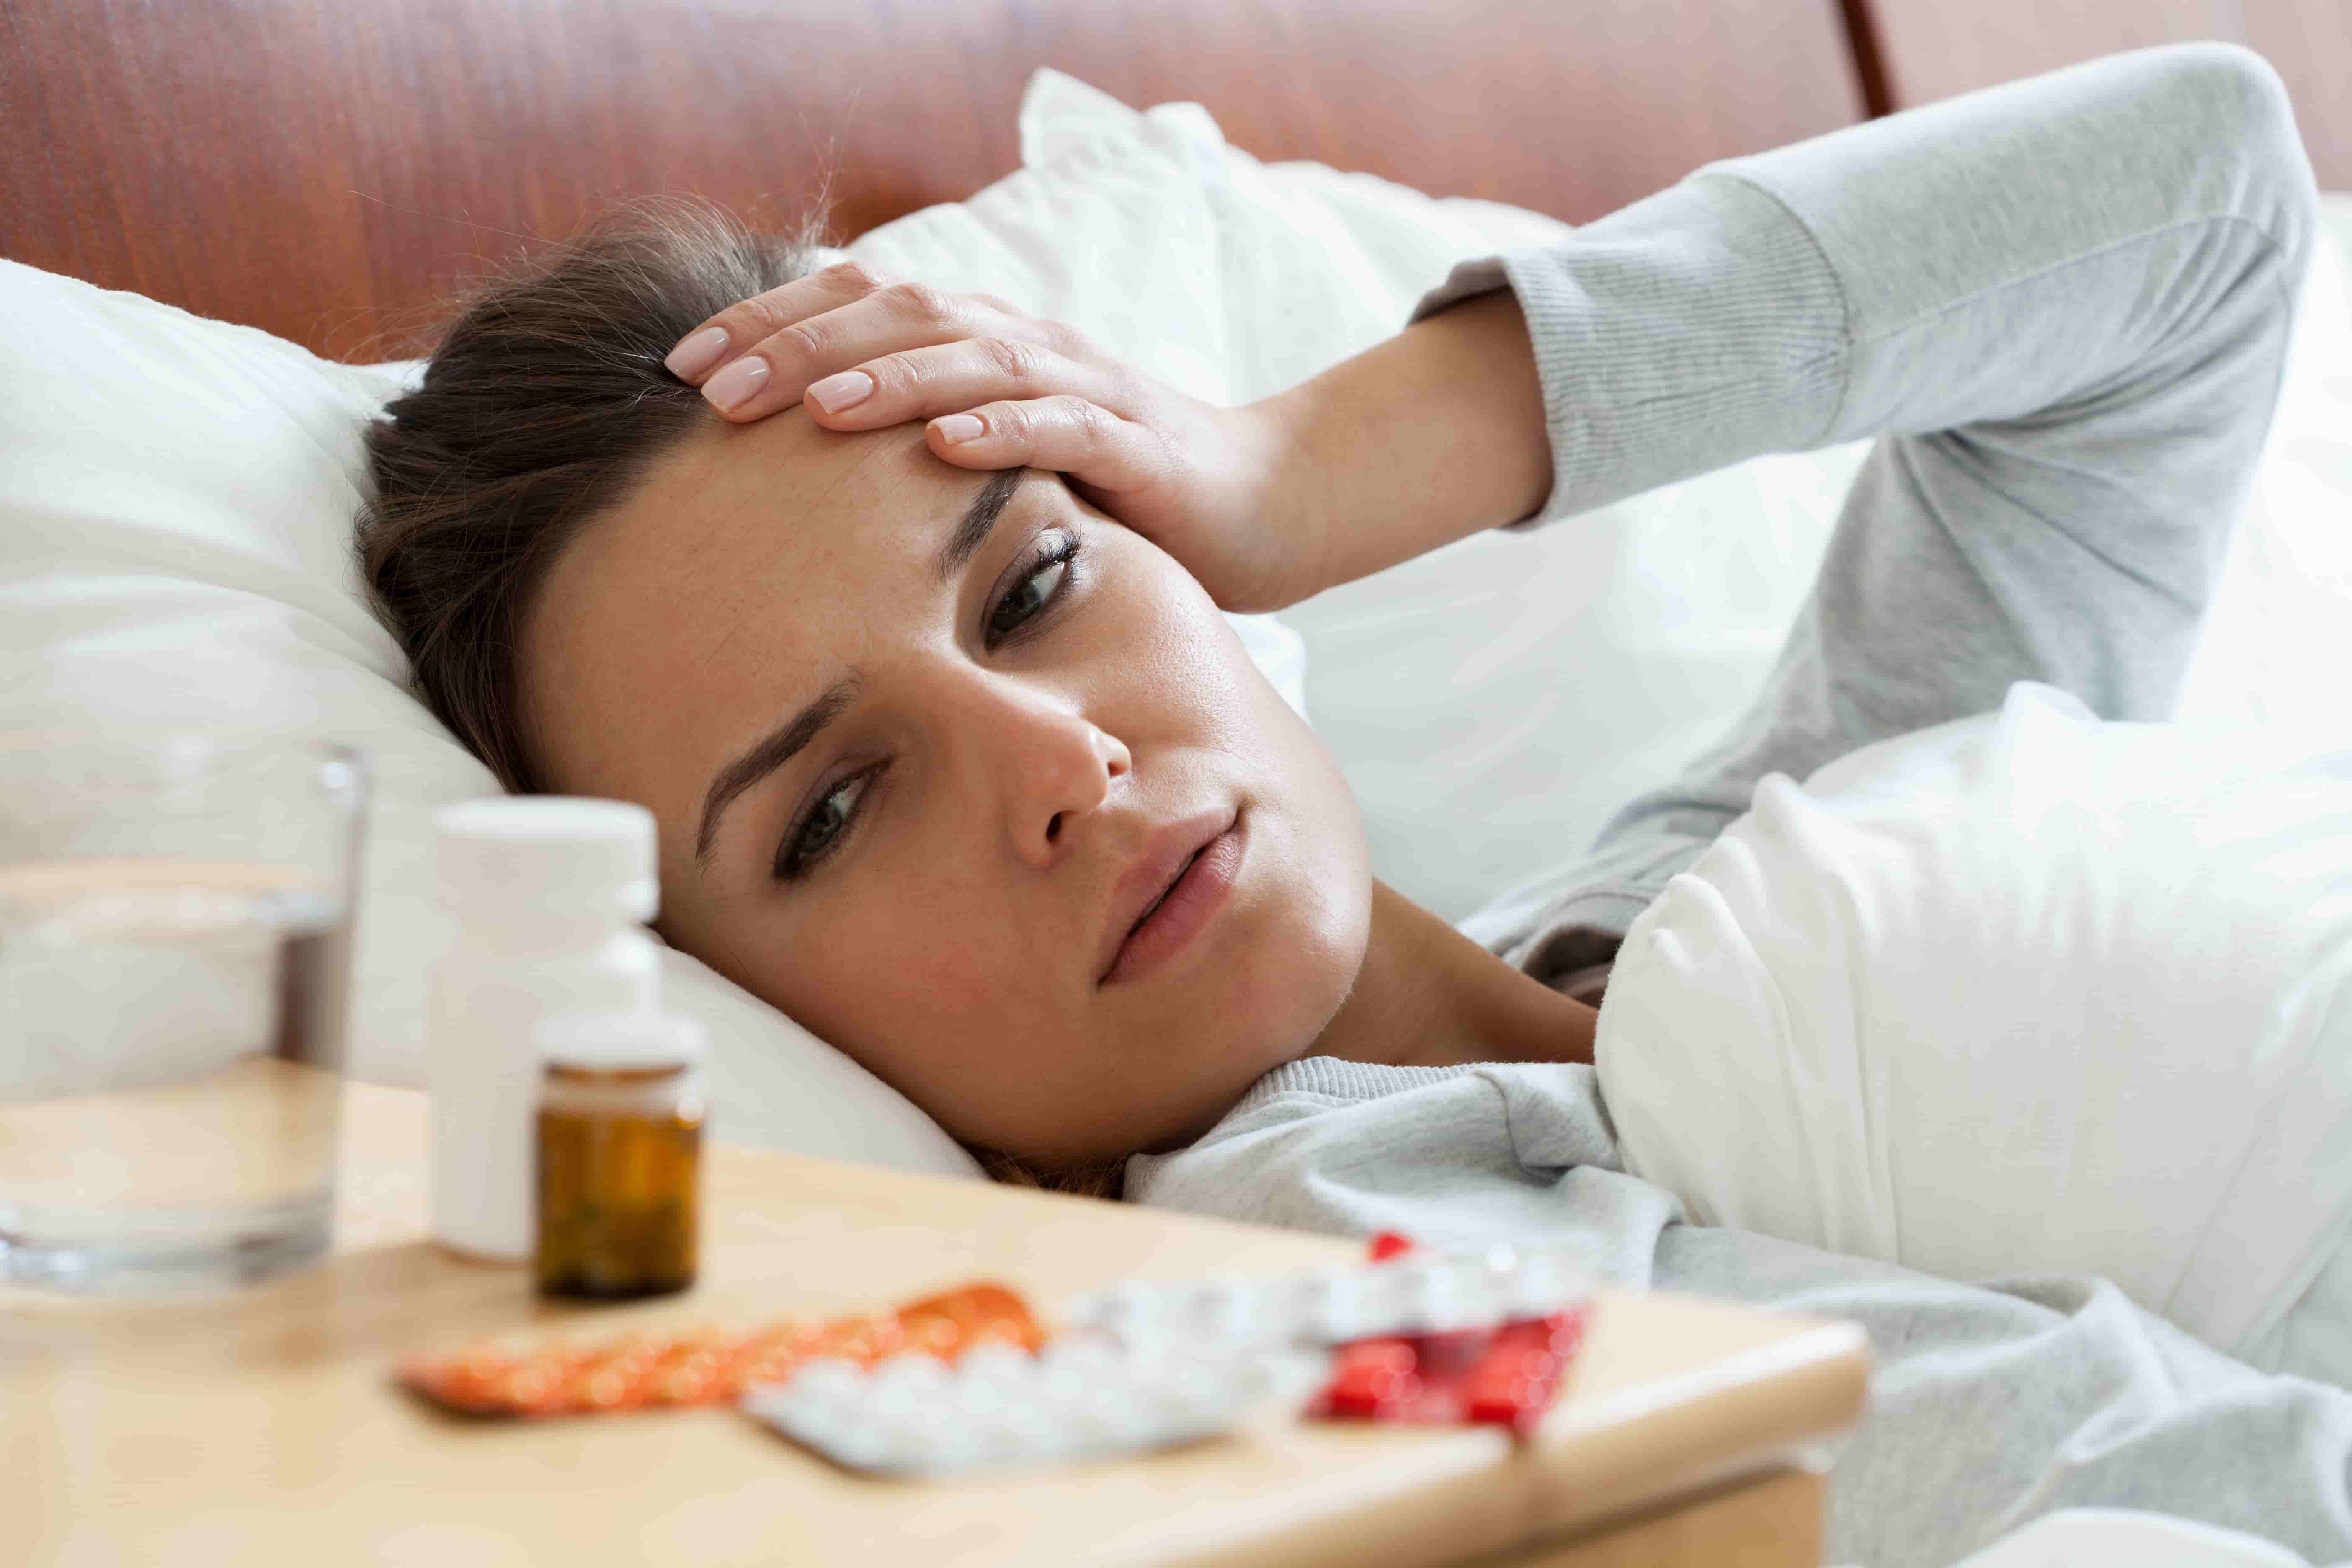 Medication overuse headache (MOH)